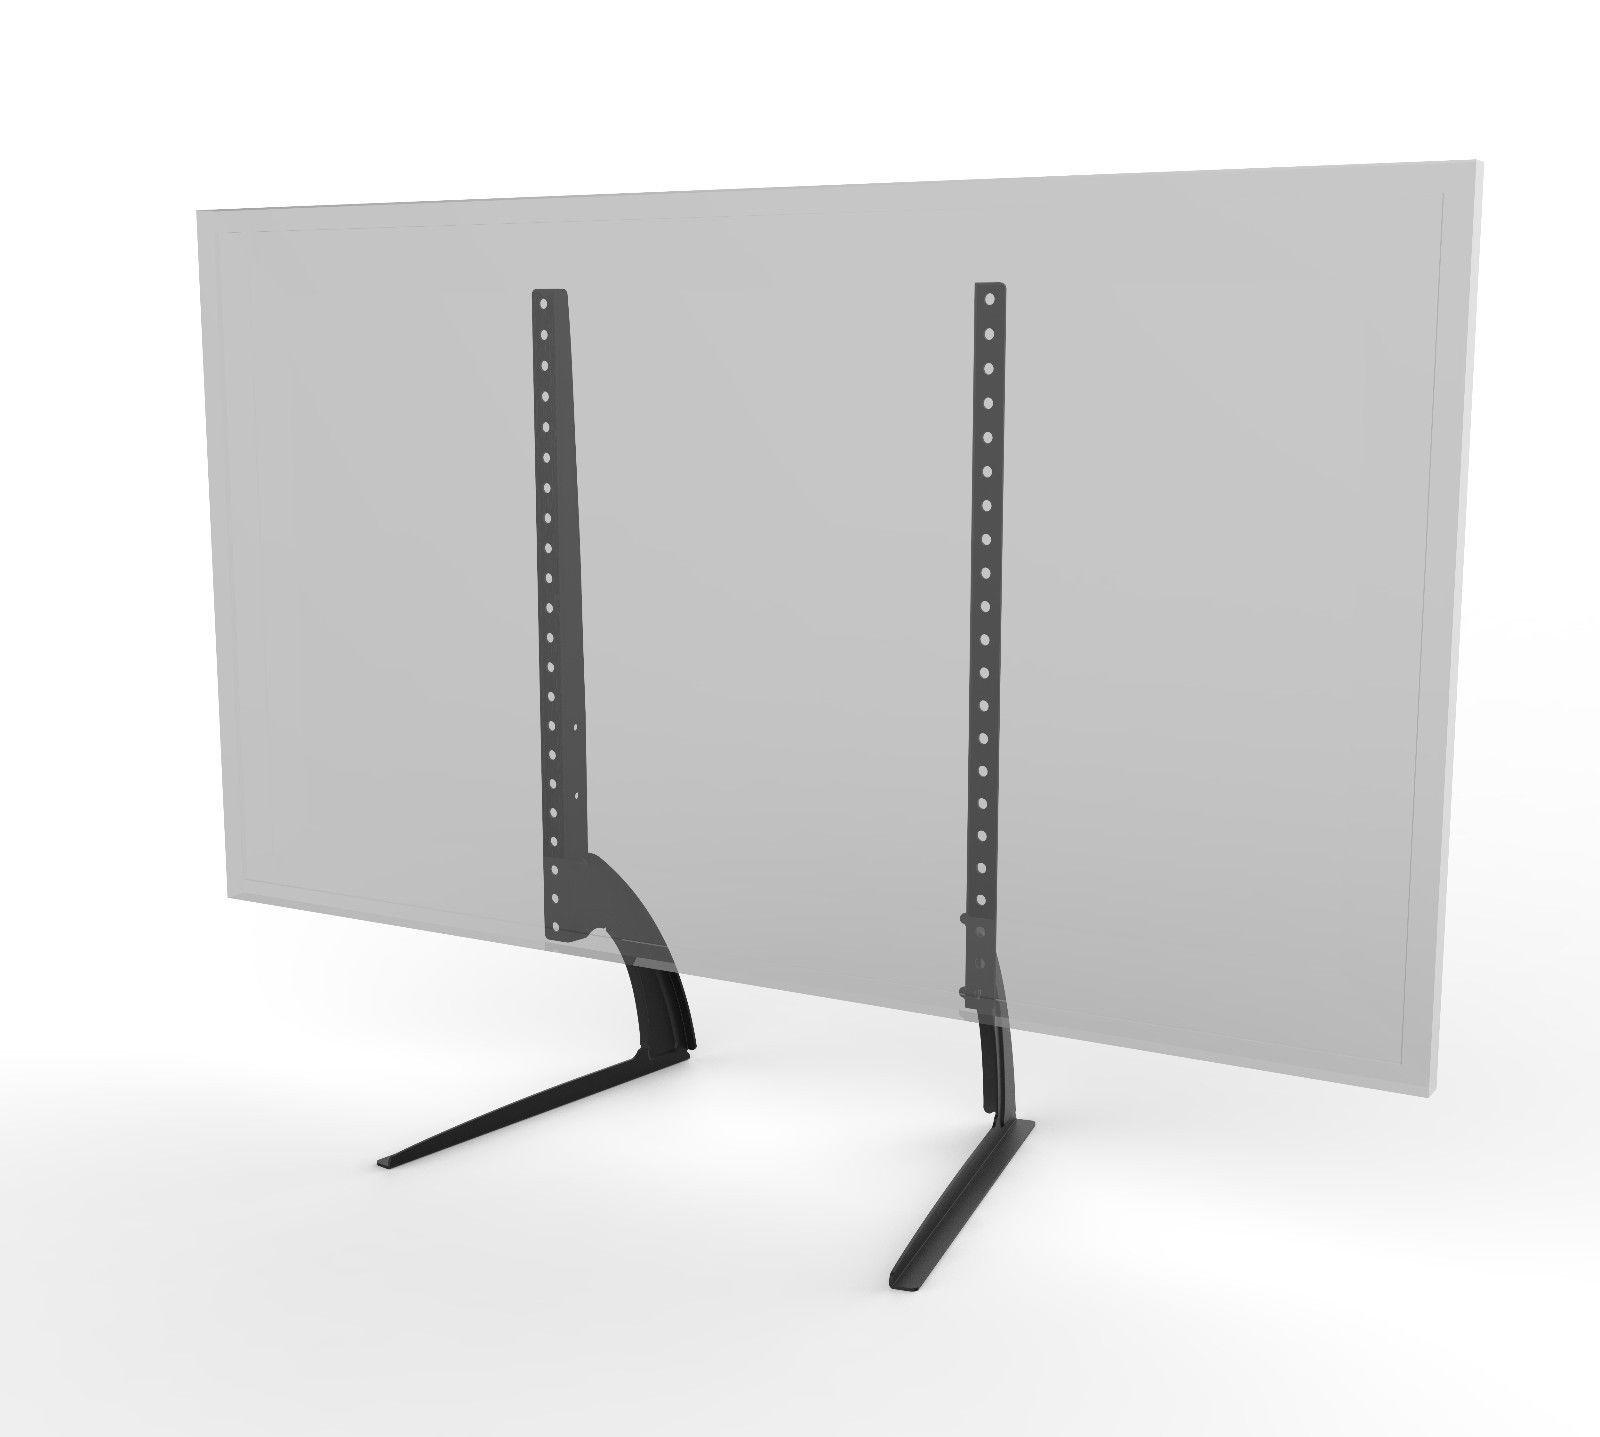 Universal Table Top TV Stand Legs for Toshiba 42RV530U Height Adjustable